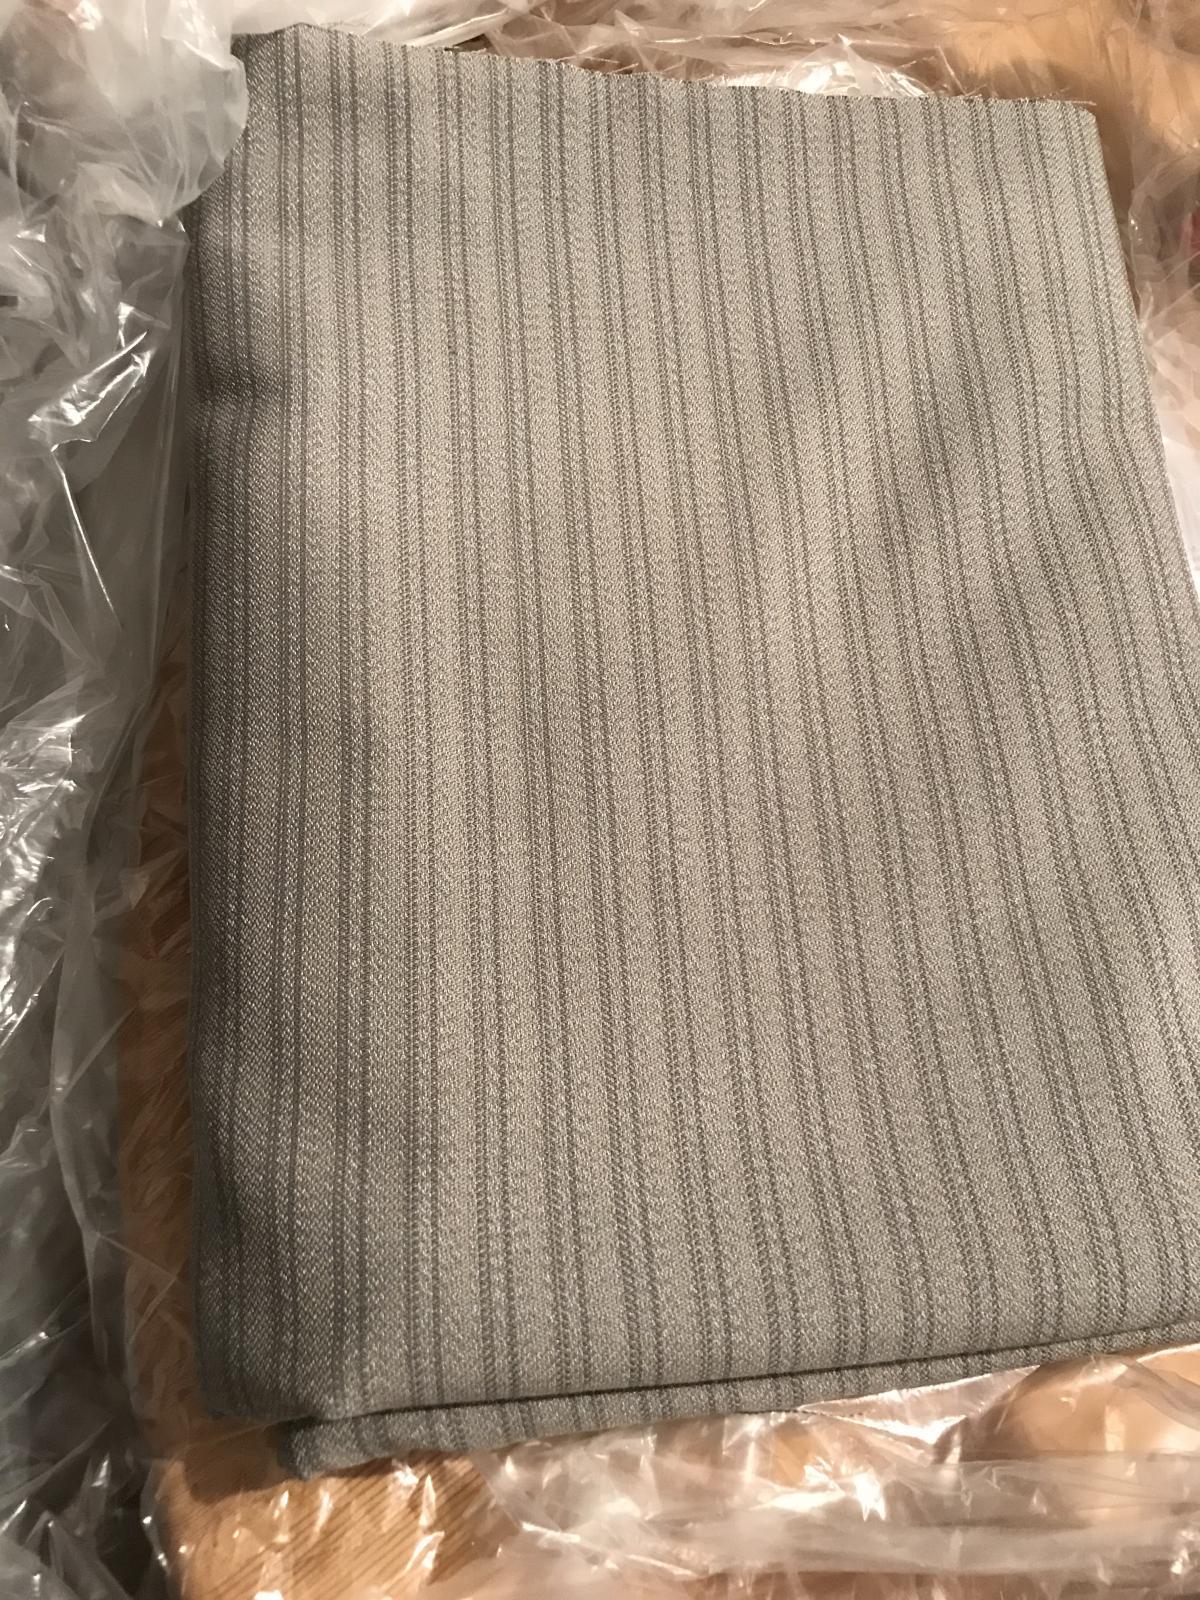 49-53 standard fabric